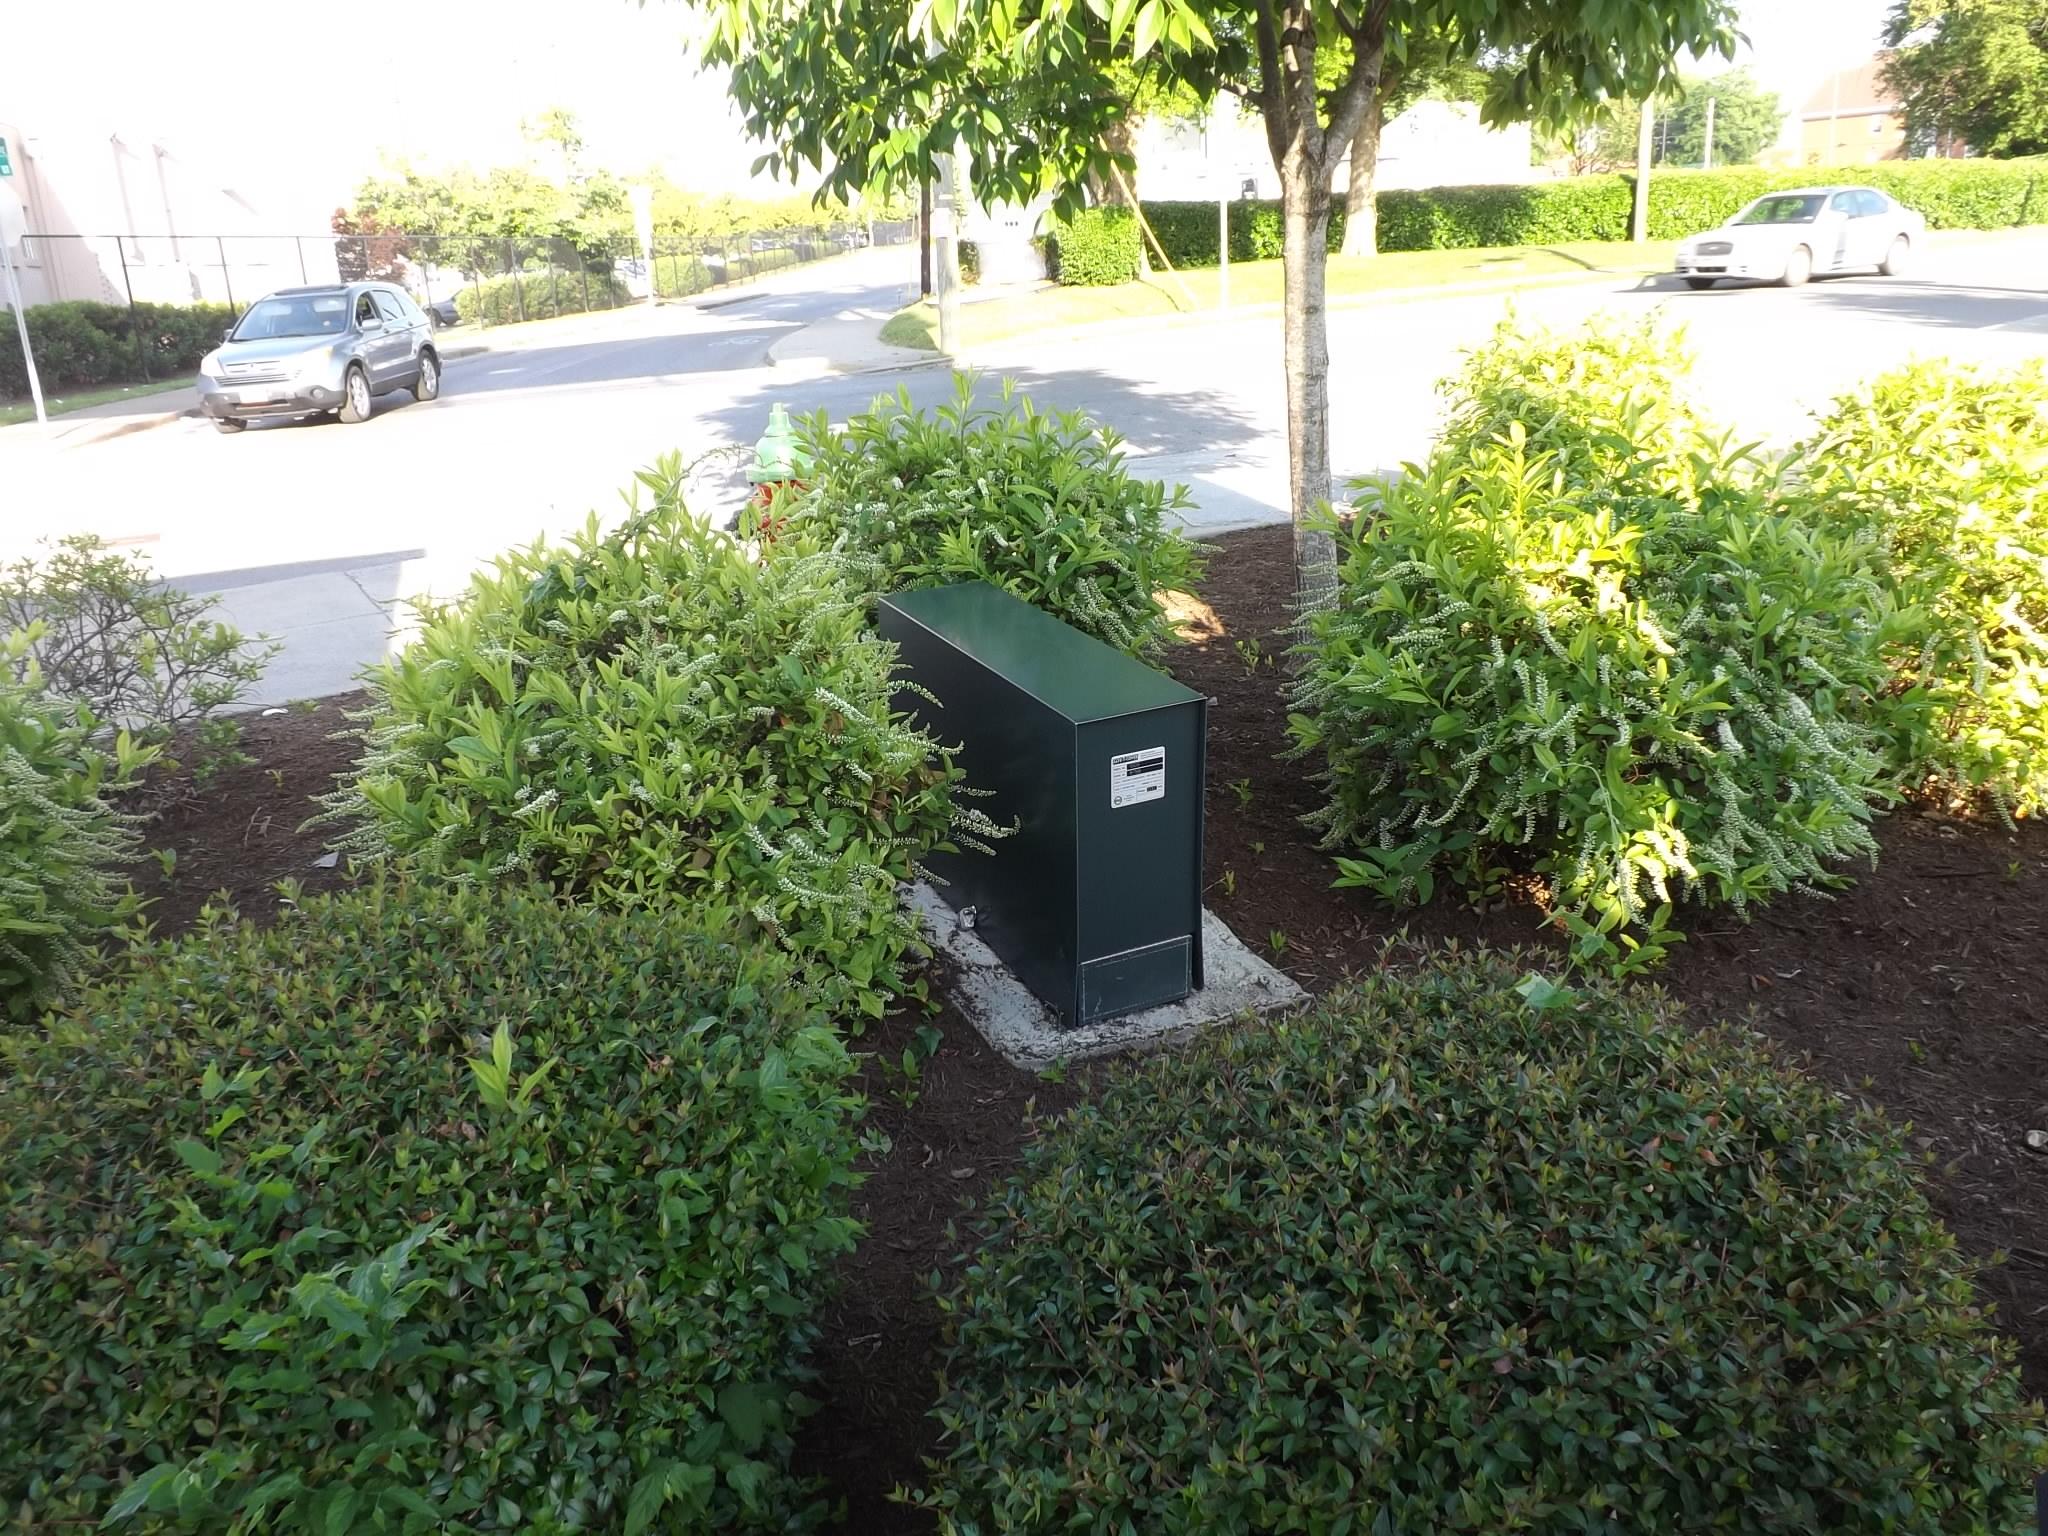 hartford green enclosure in landscaping.jpg